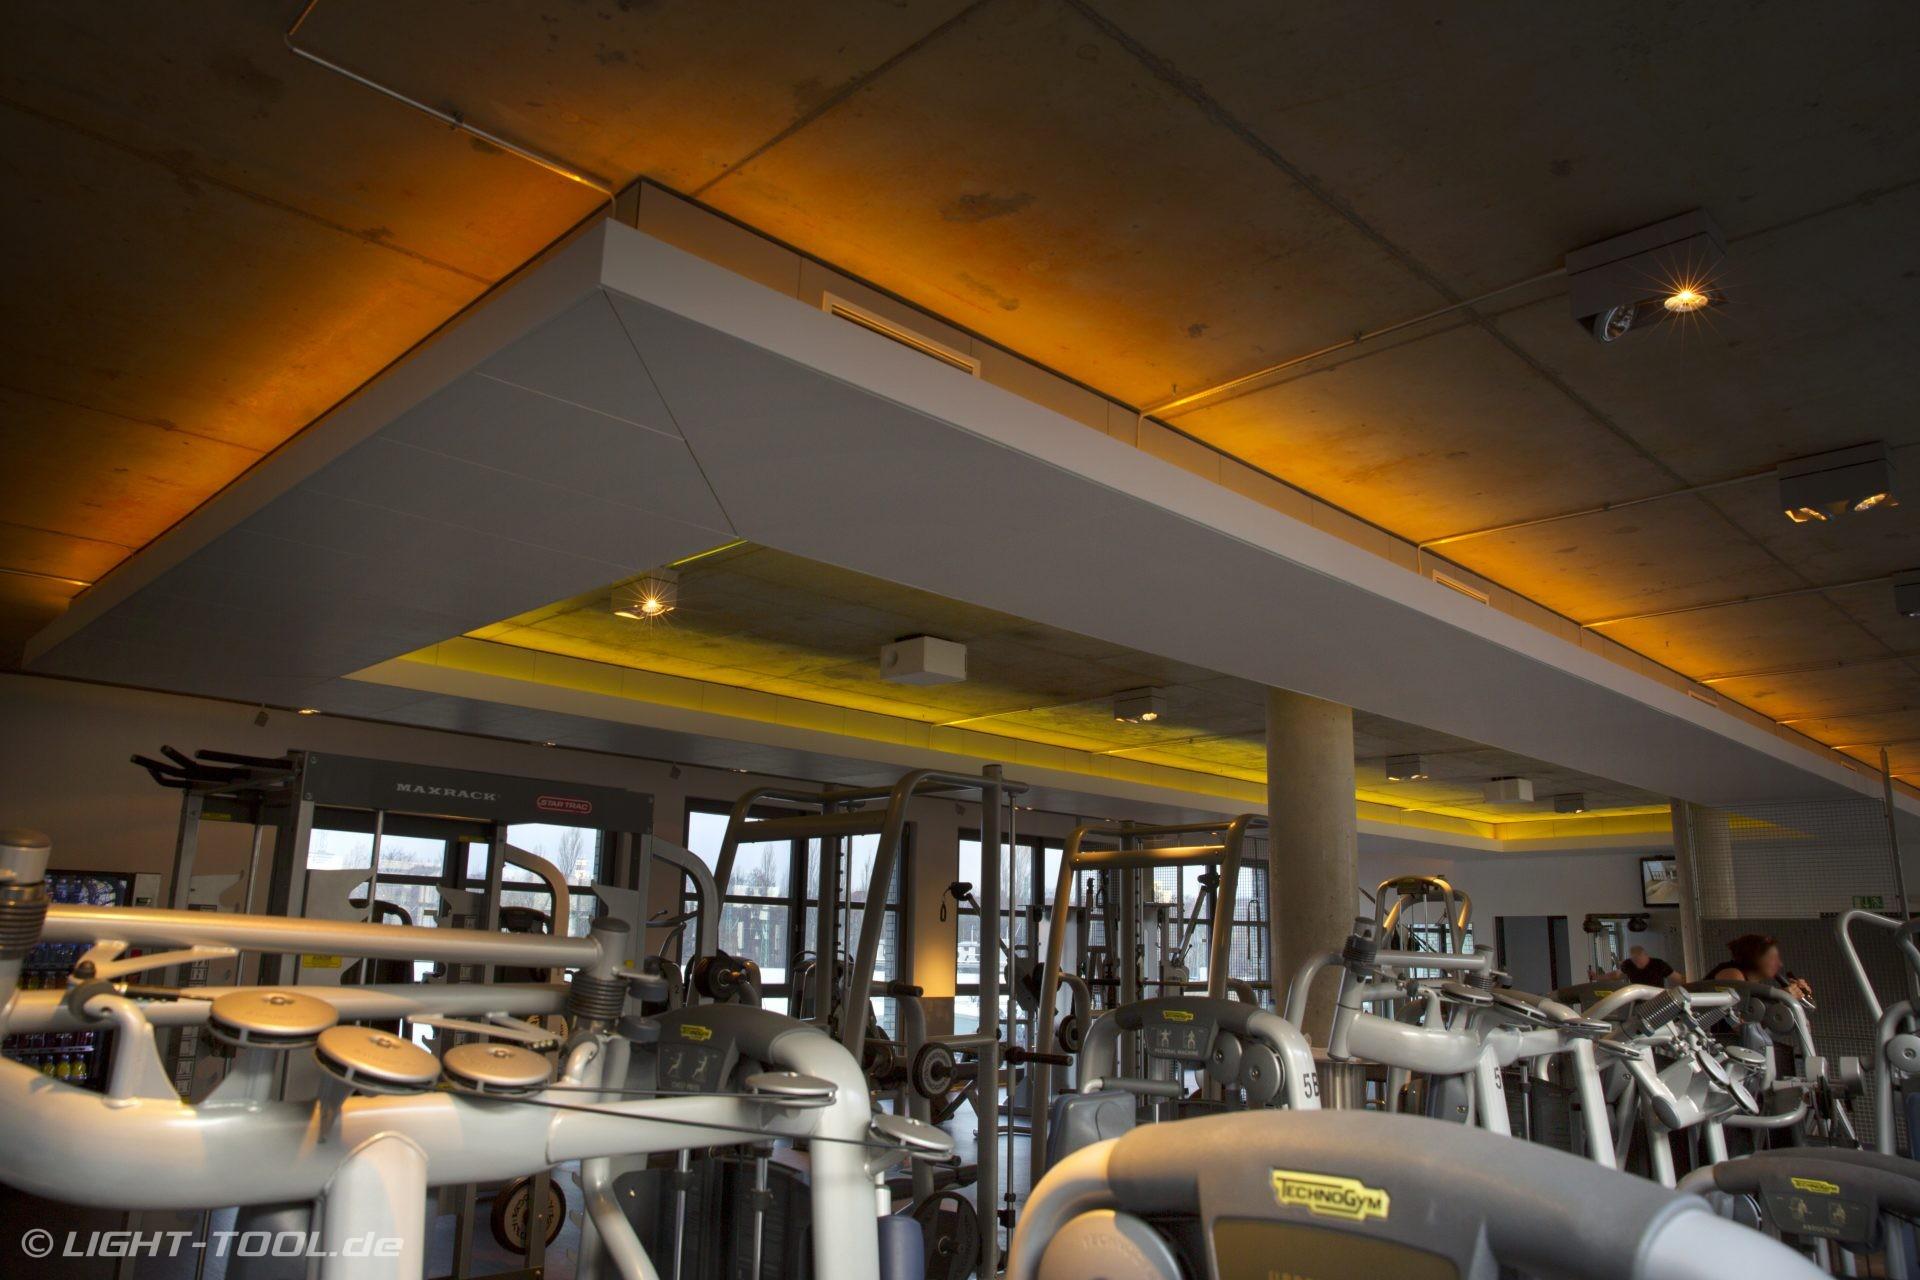 led rgbw vouten und ambientebeleuchtung im fitnessstudio aspria spa berlin light tool. Black Bedroom Furniture Sets. Home Design Ideas